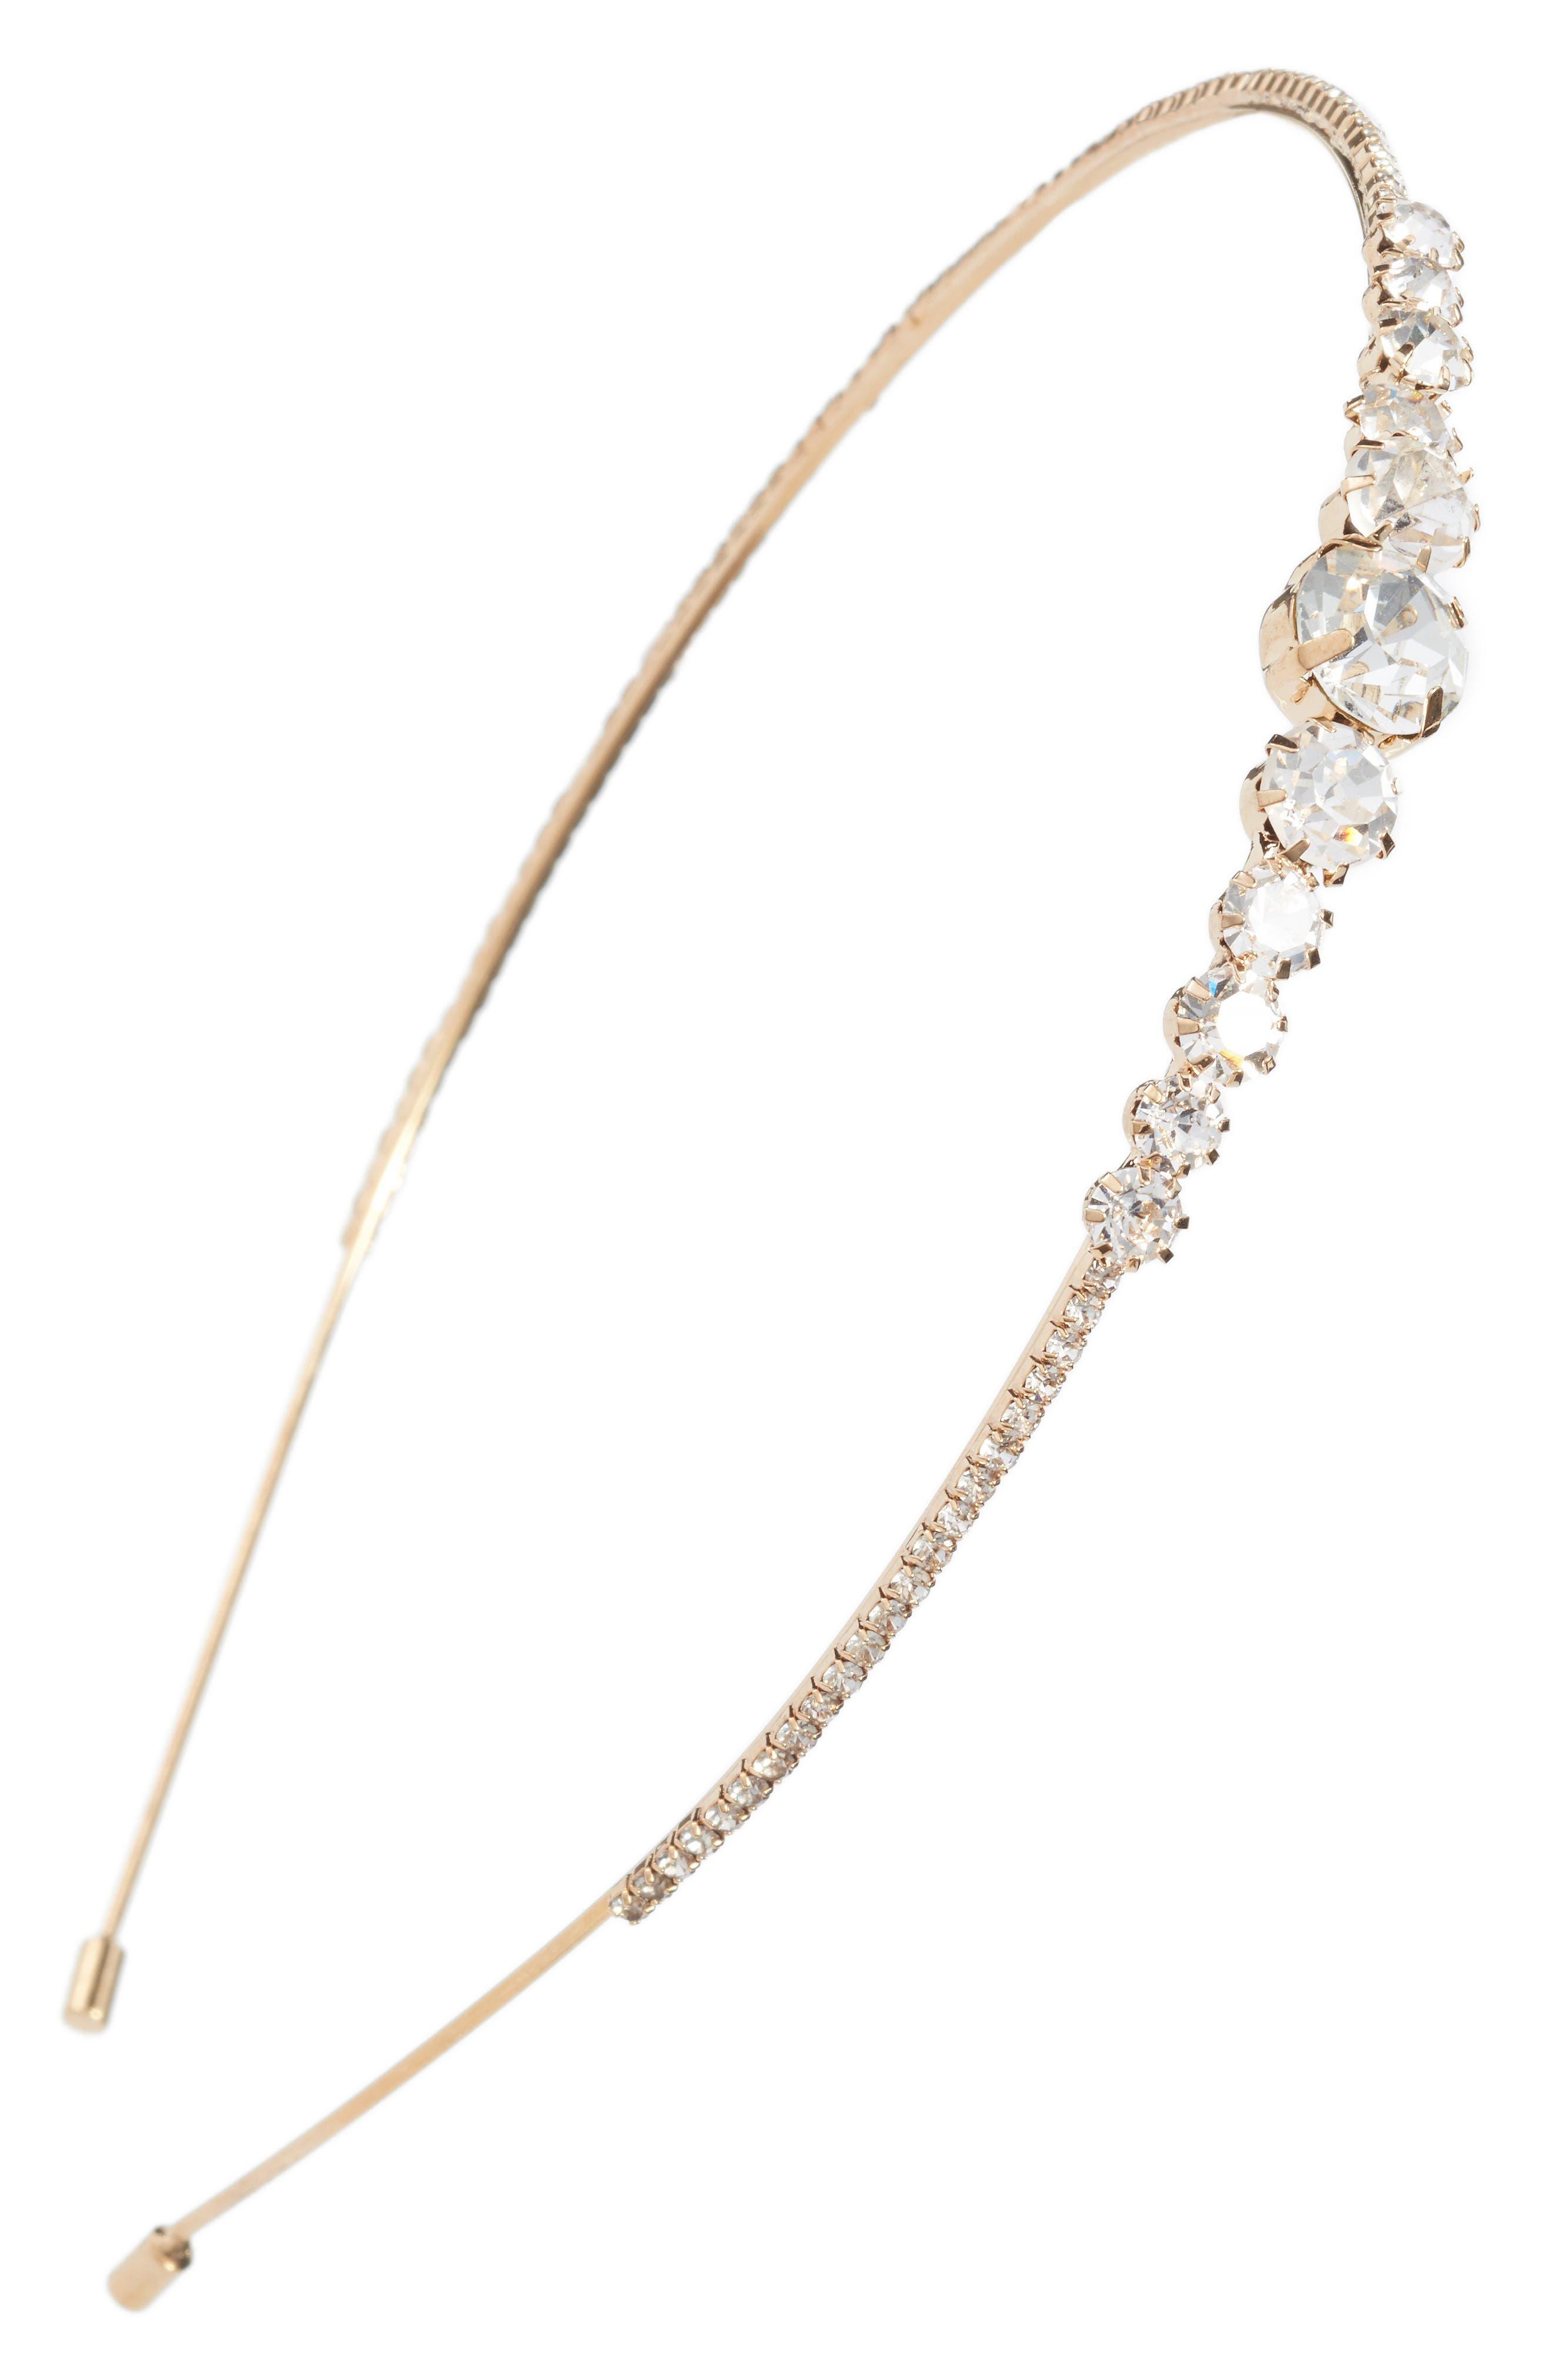 Main Image - Tasha Crystal Embellished Headband